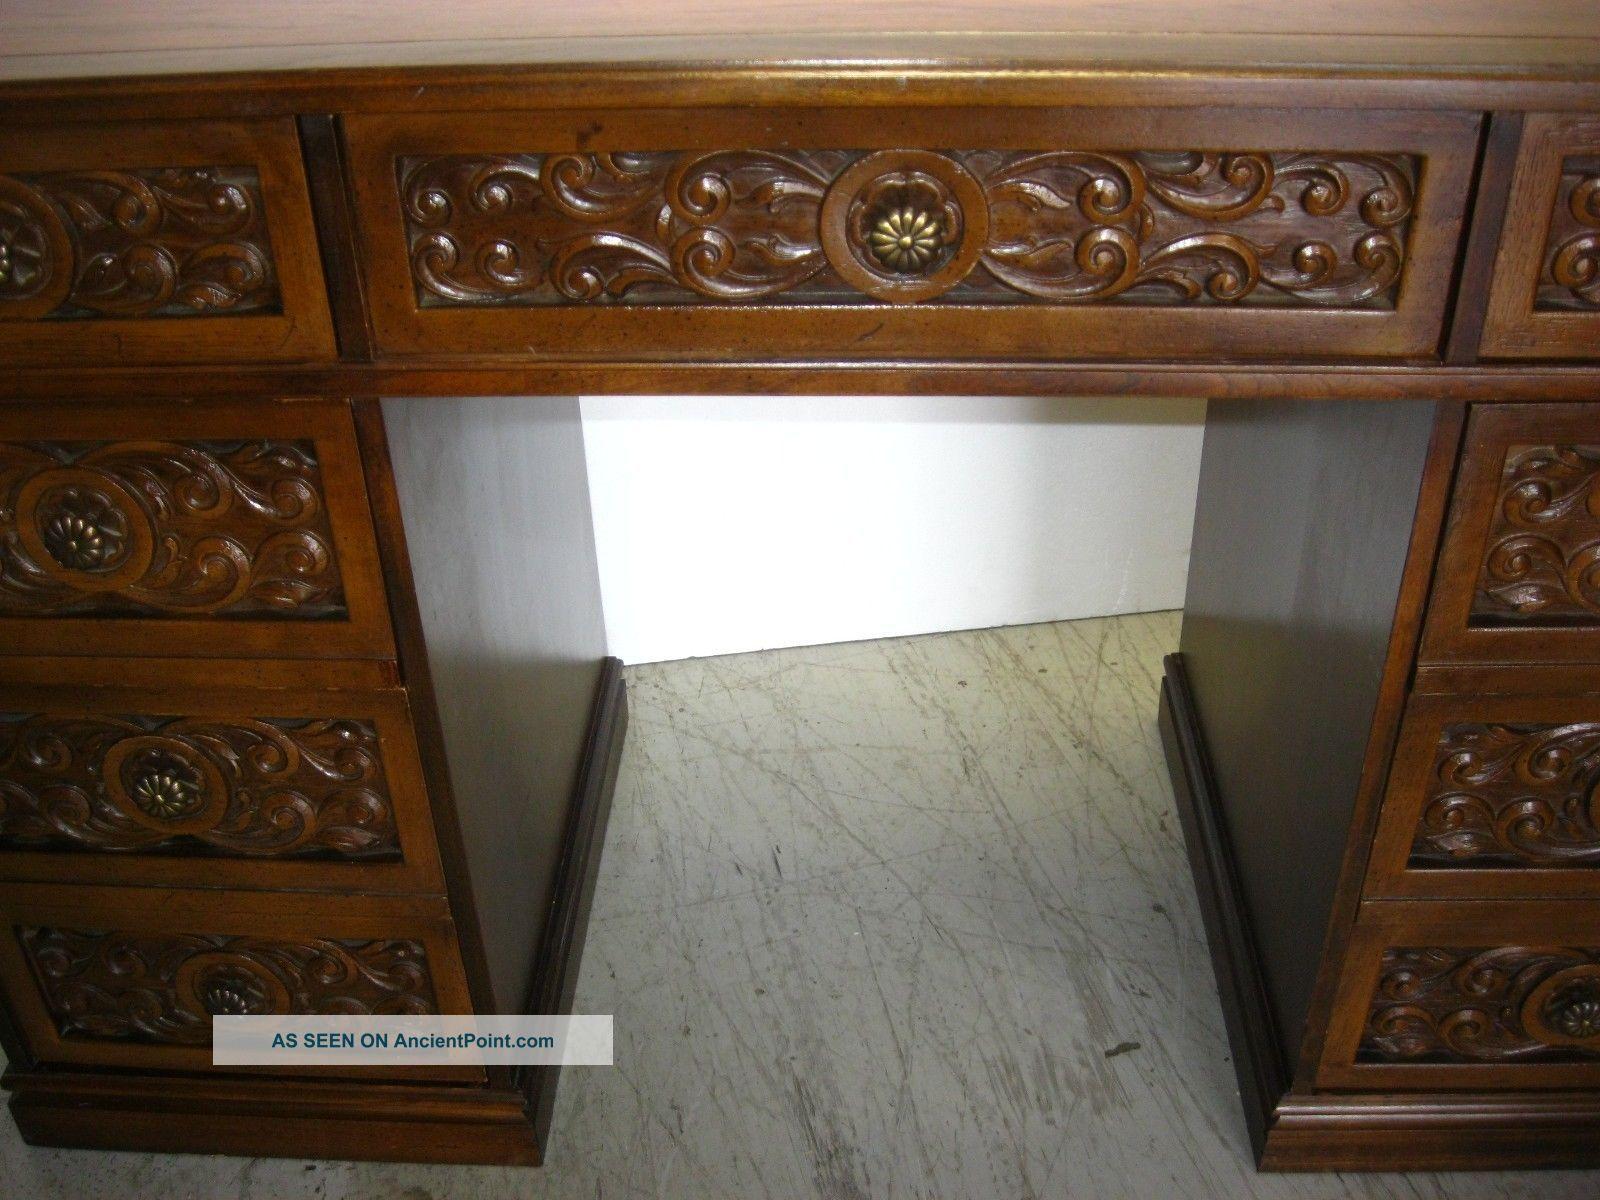 Outstanding Vintage Style Computer Desk 1600 X 1200 257 Kb Jpeg